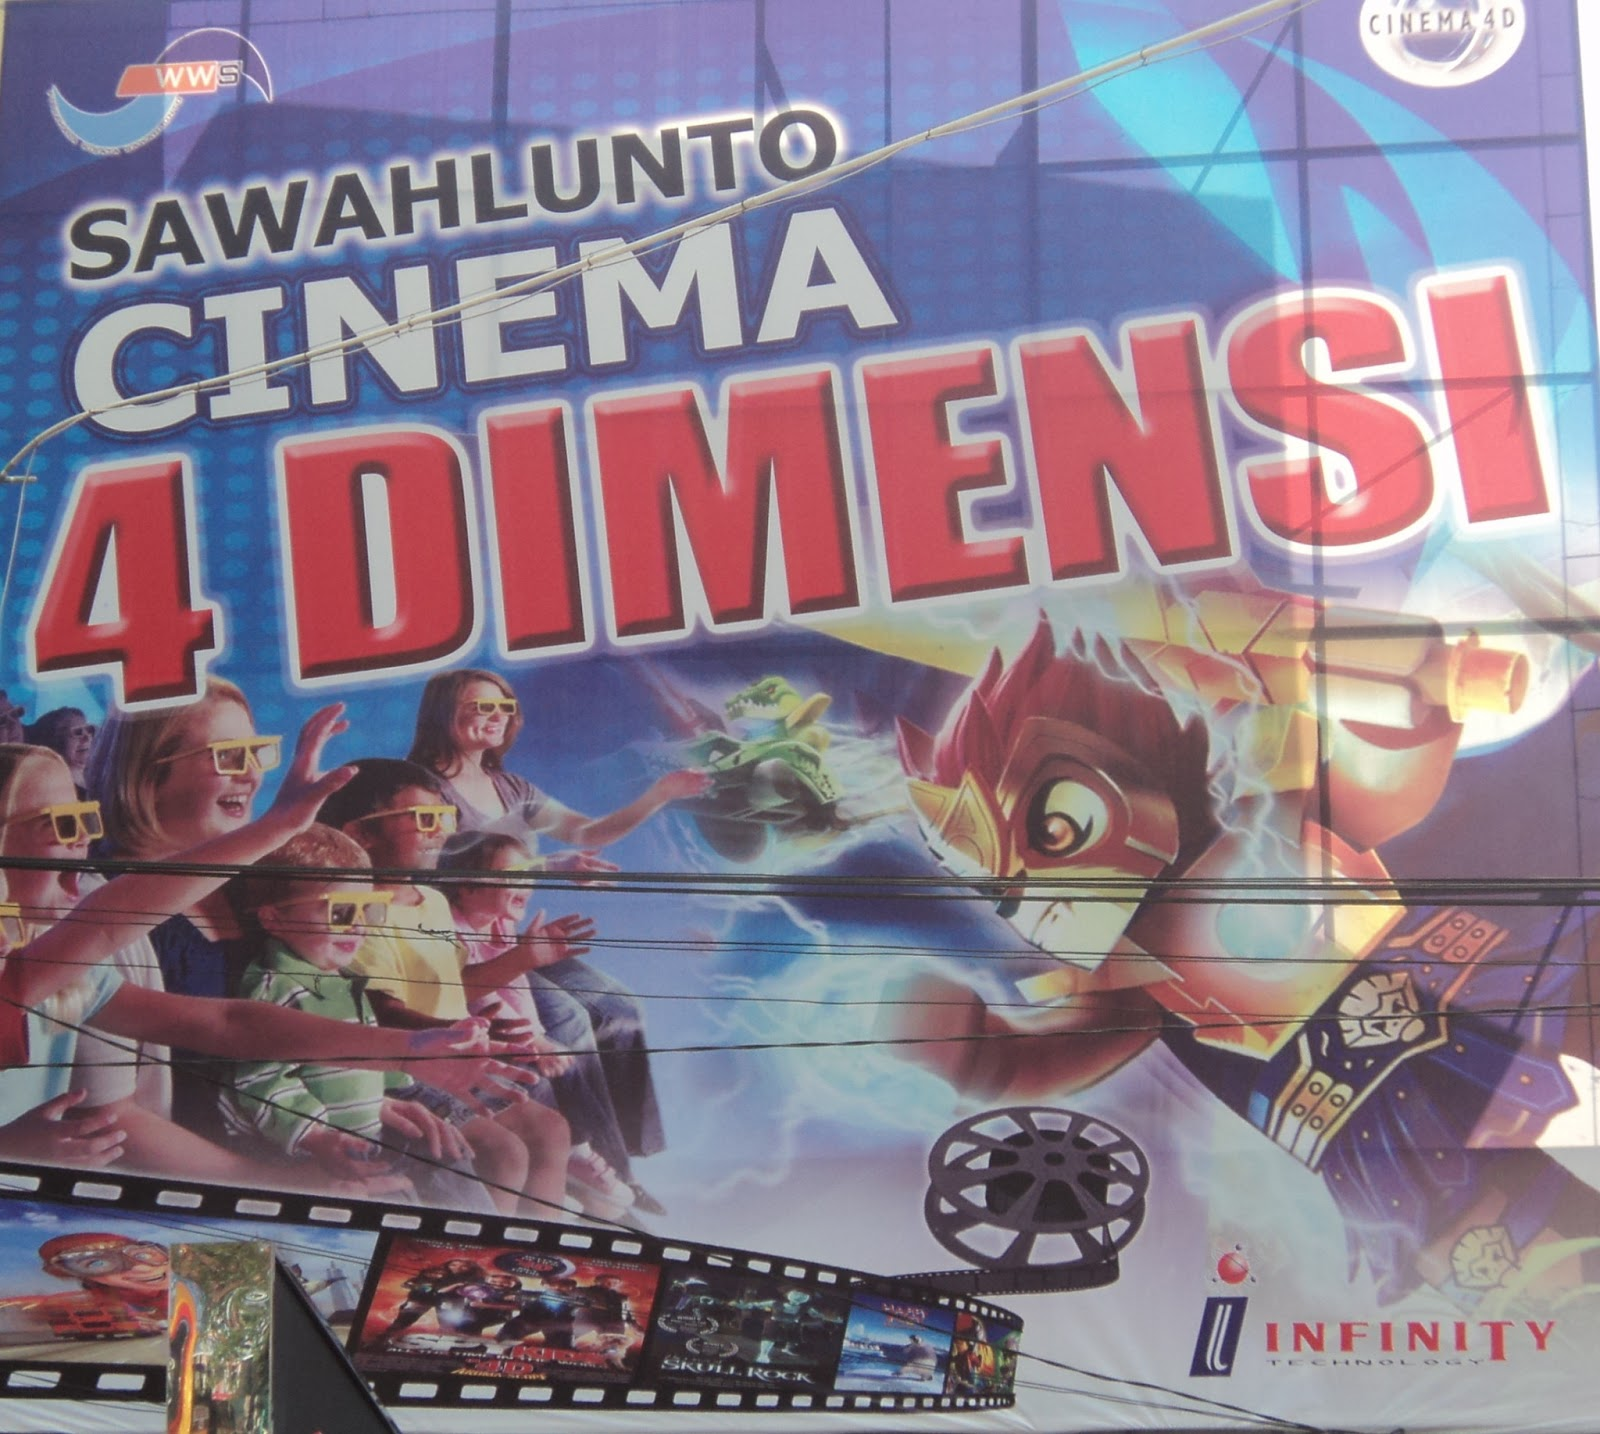 Sawahlunto Cinema  Dimensi